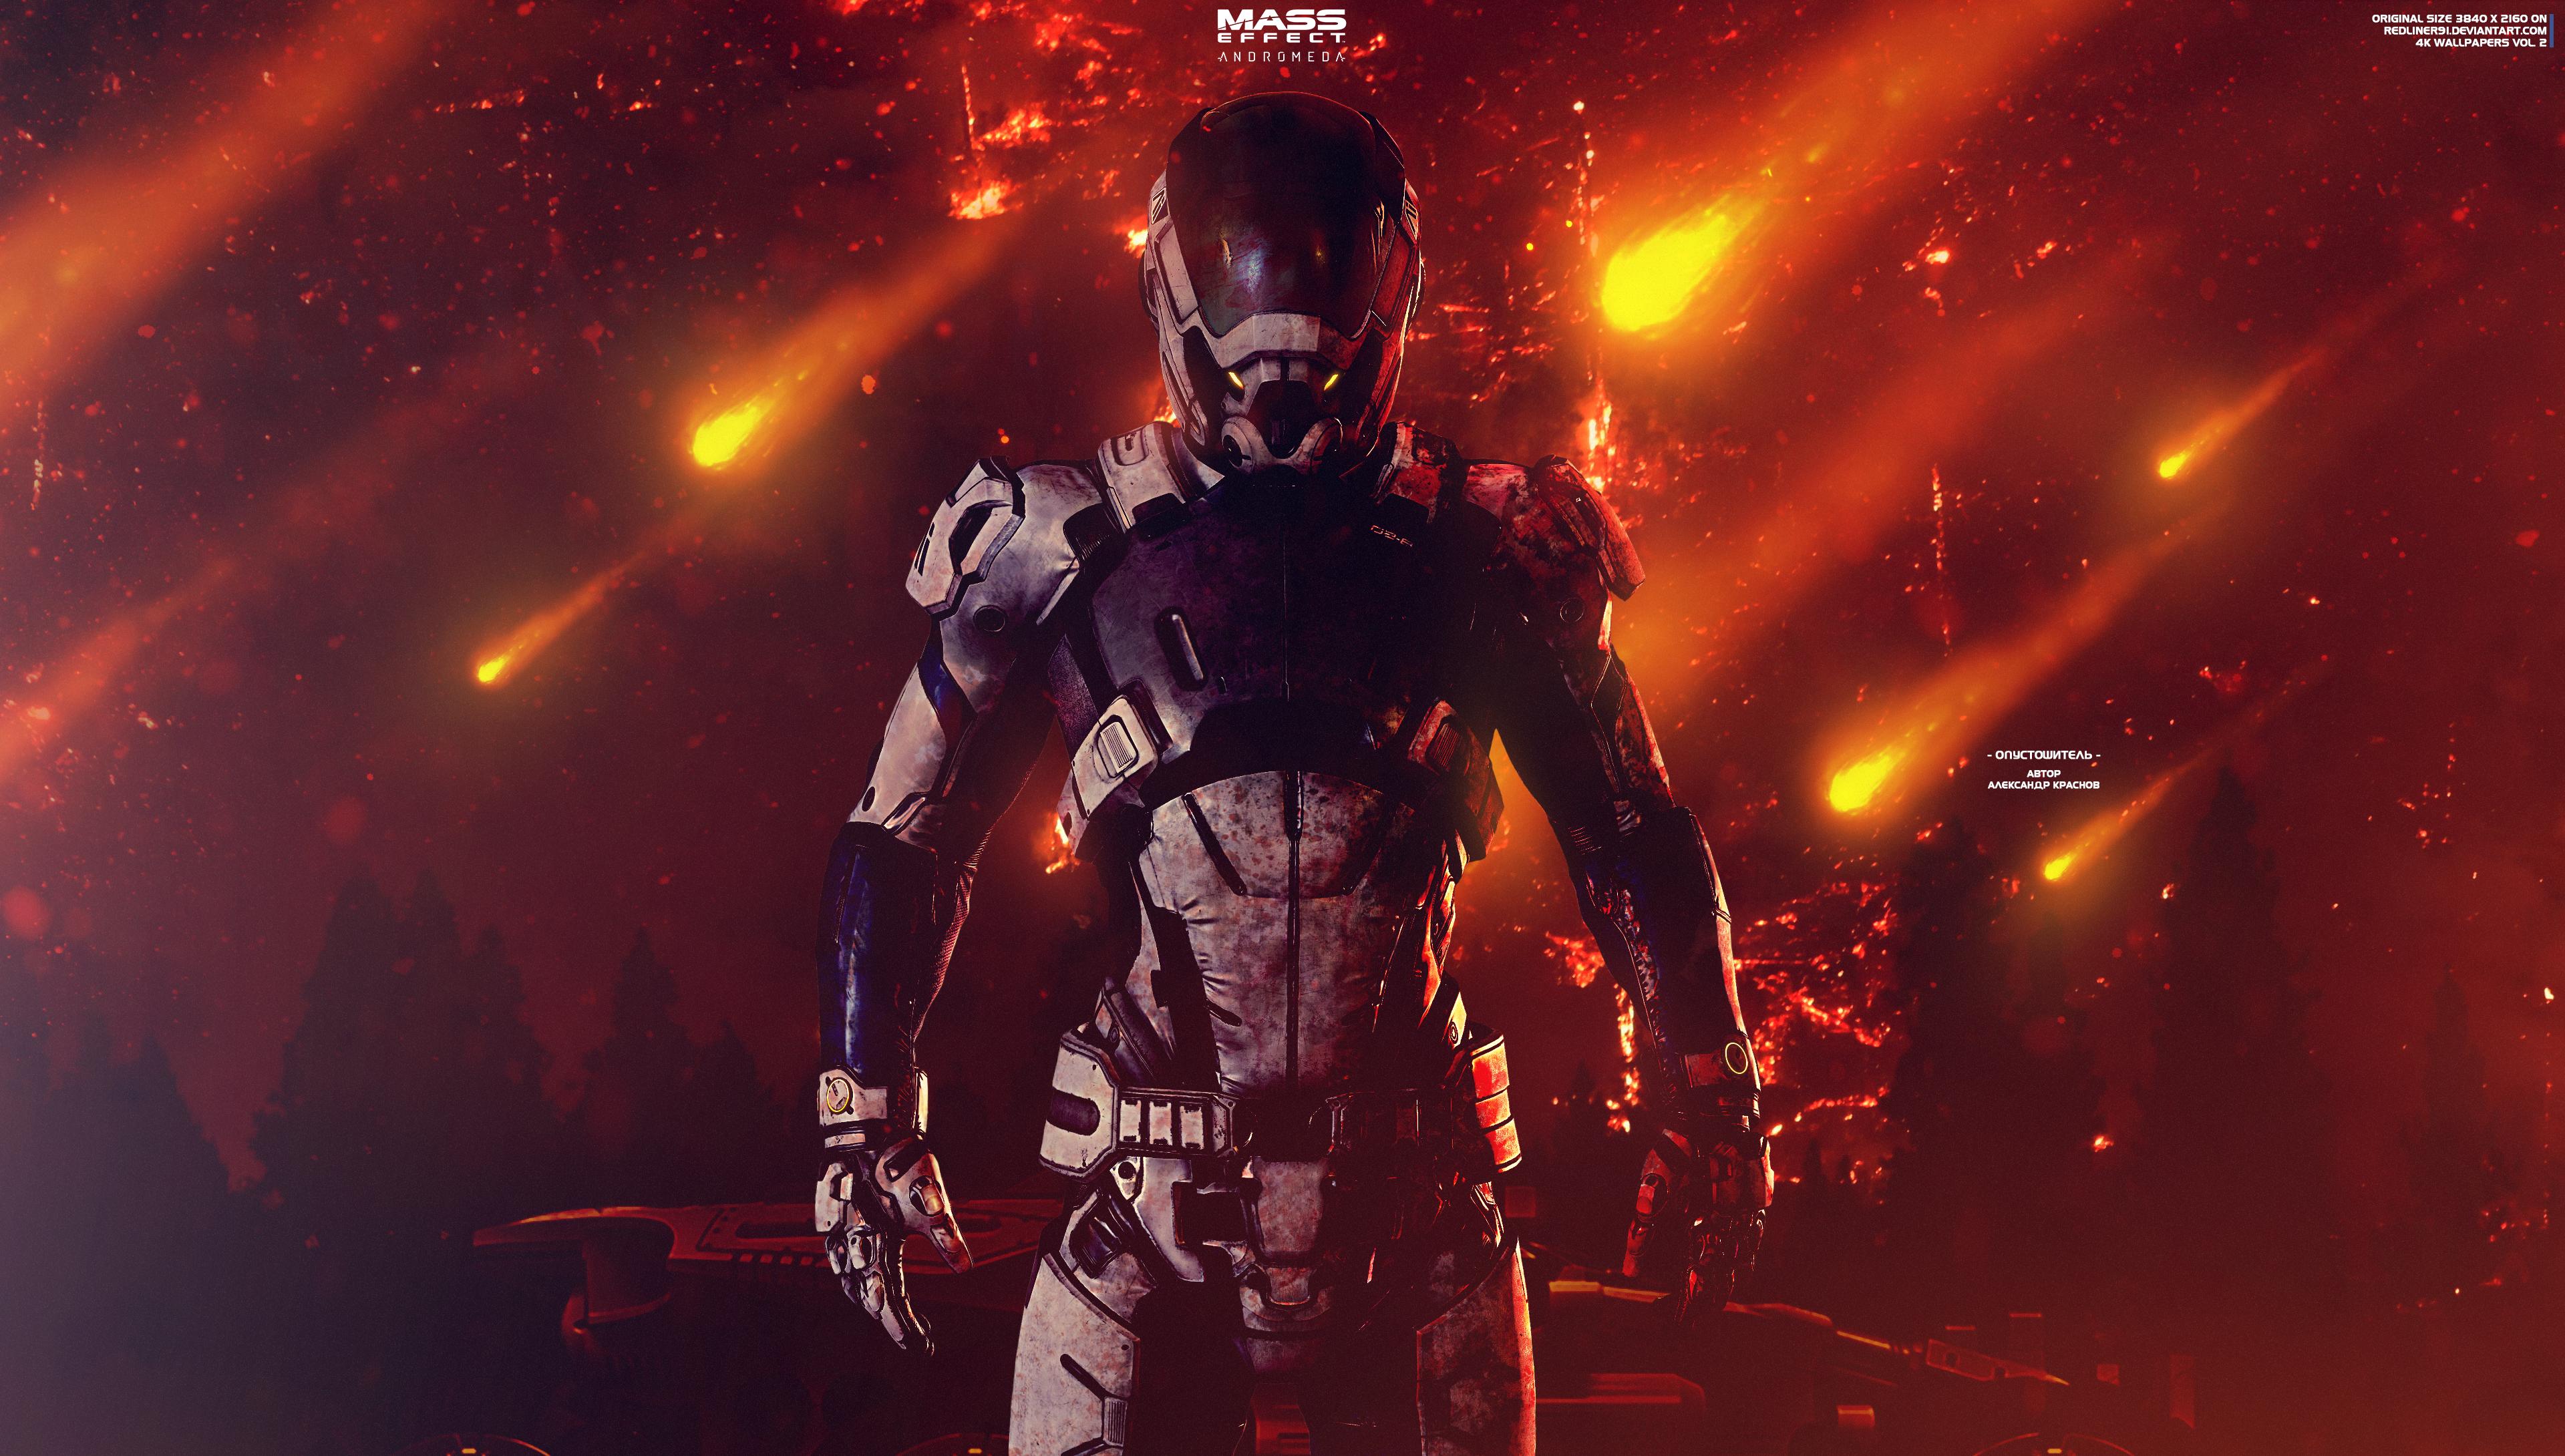 Devastator Mass Effect Andromeda Wallpapers 4k By Redliner91 Mass Effect Mass Mass Effect Universe